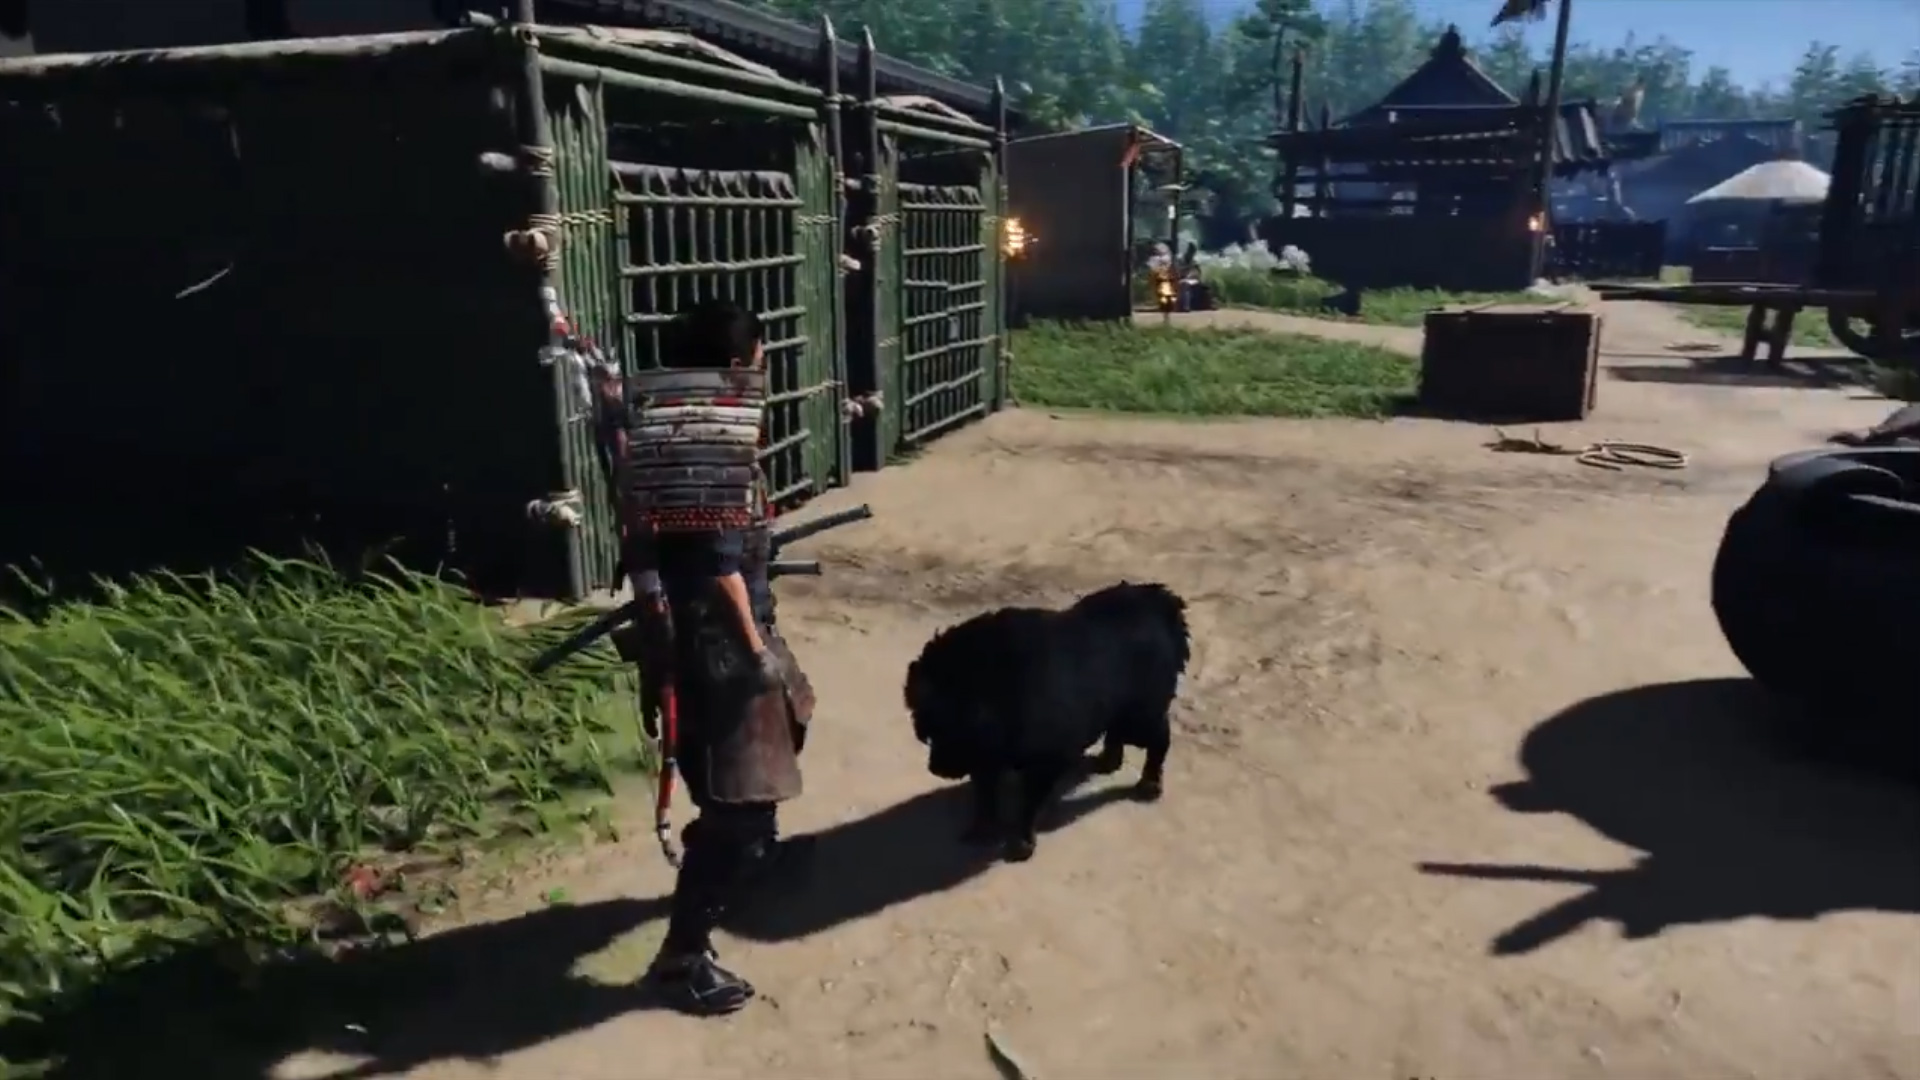 Ghost of Tsushima has a dog-befriending charm in New Game+ screenshot